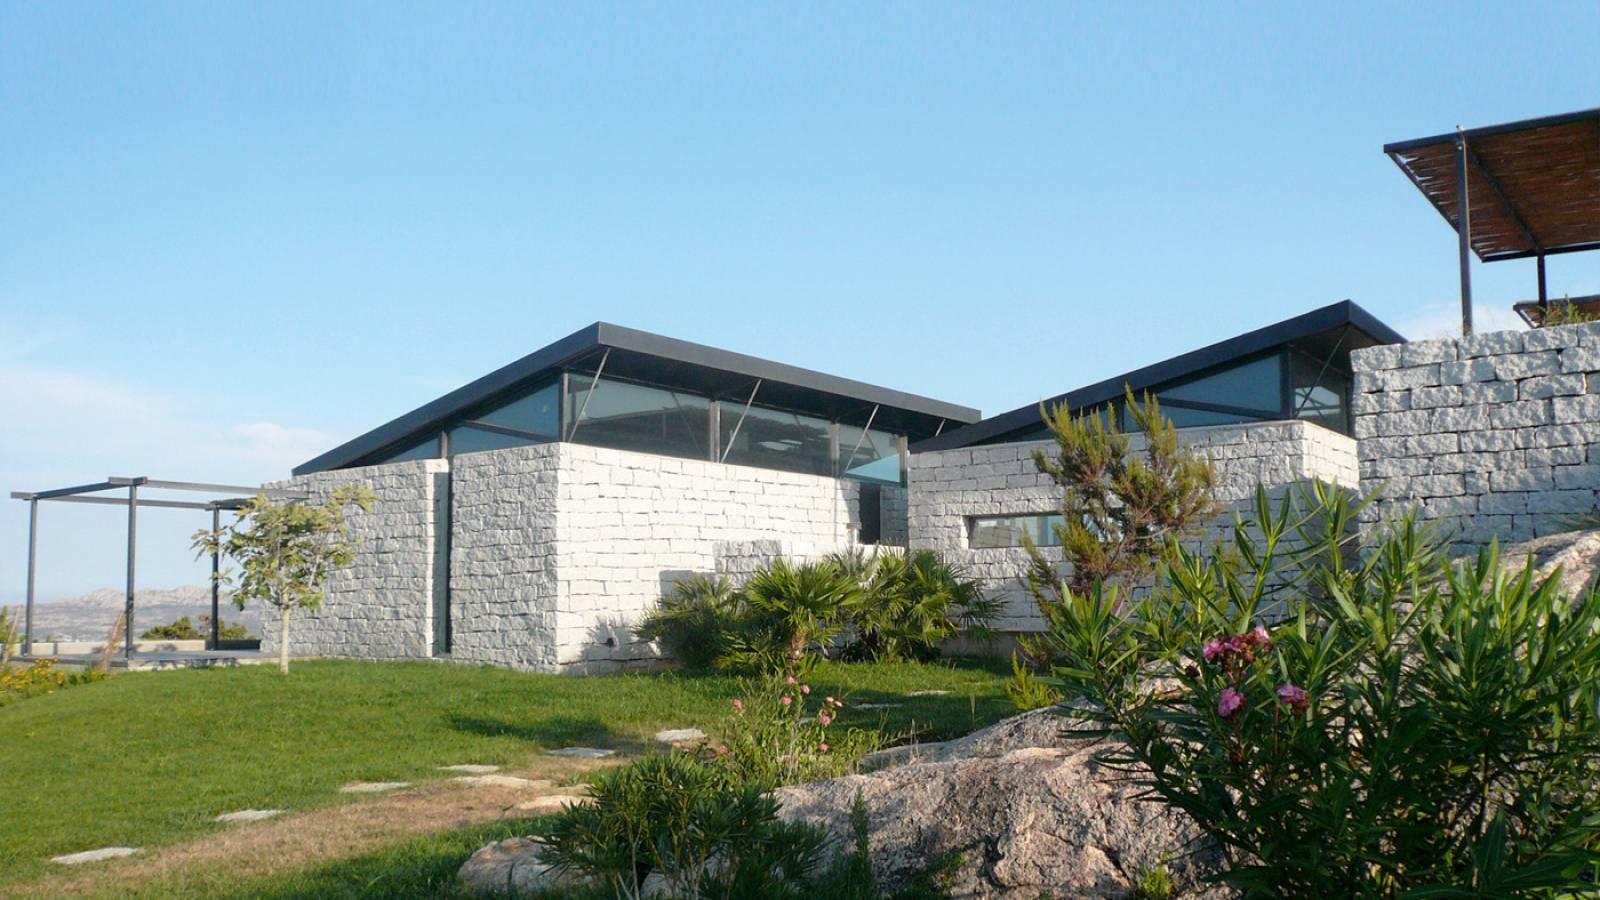 Villa contemporaine m maddalena en sardaigne - Maison en pierre giordano hadamik architects ...